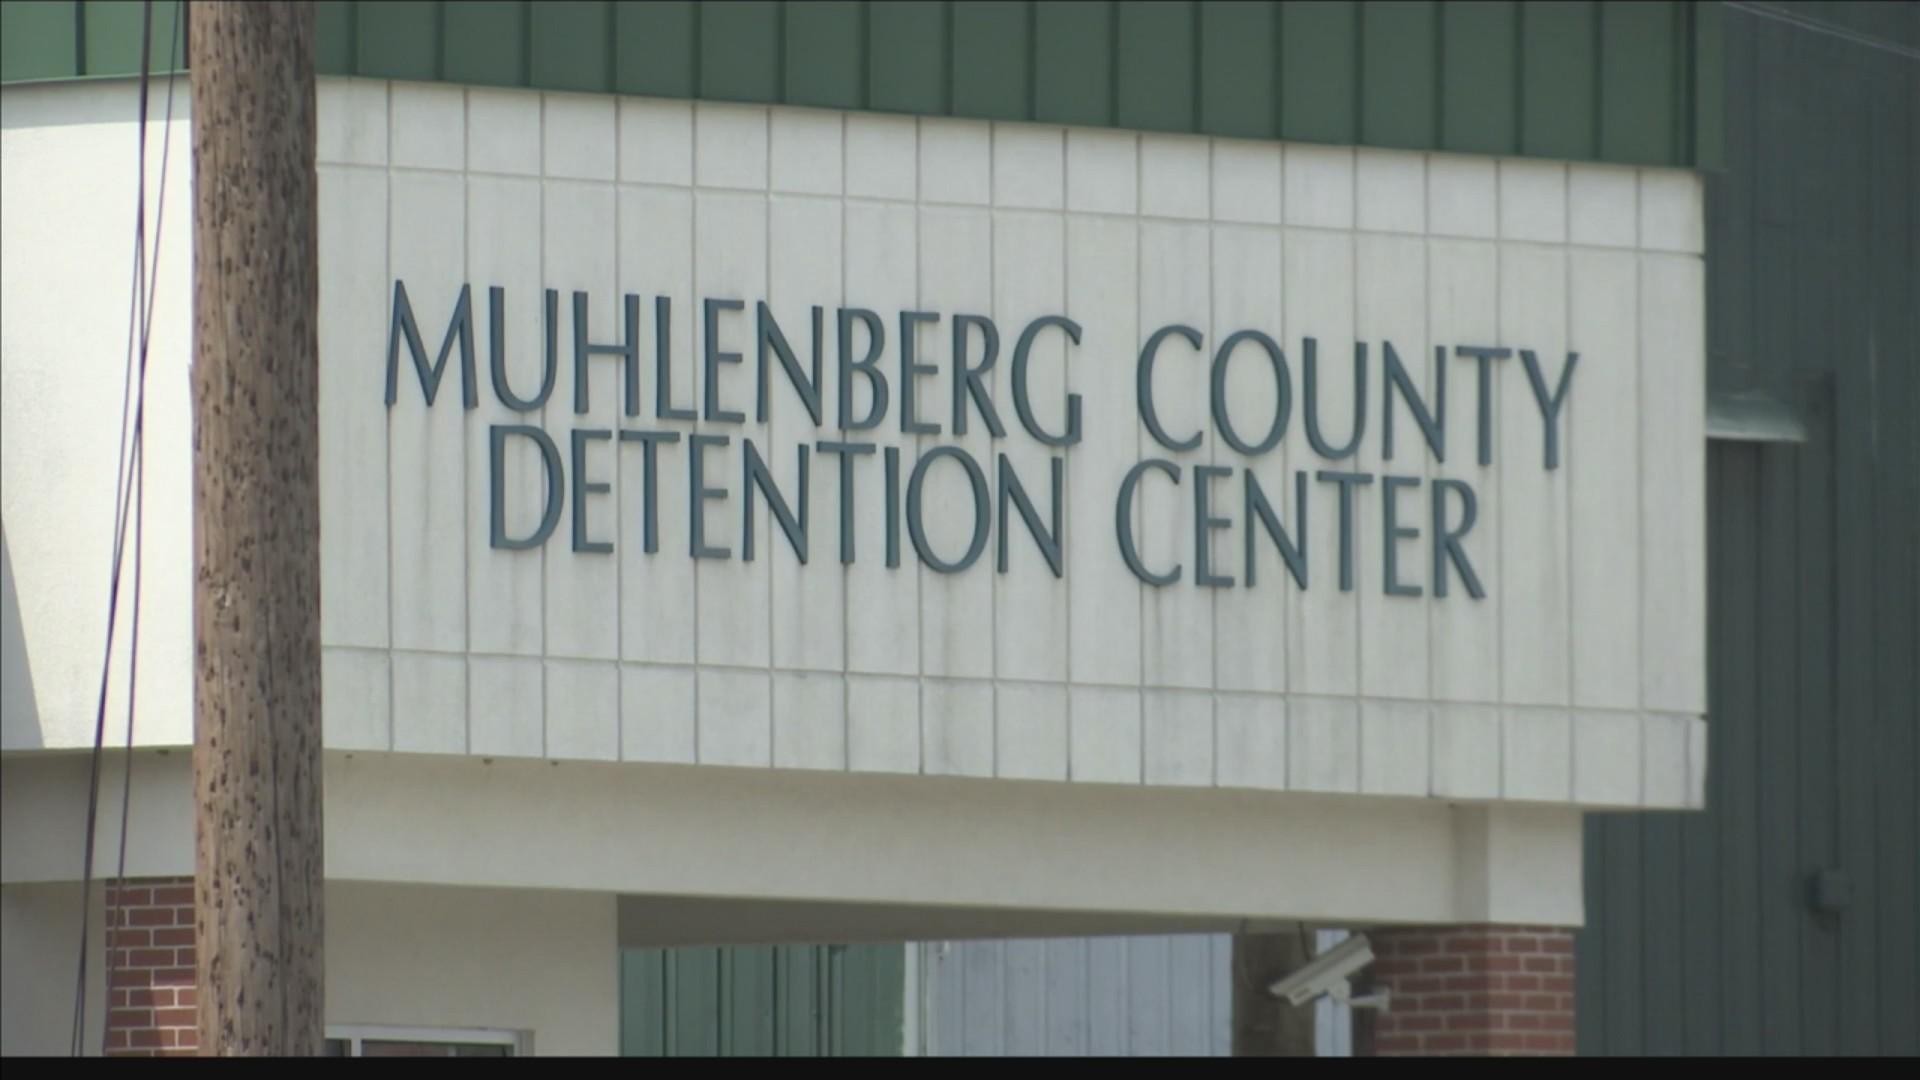 Muhlenberg_Co__jailer_accused_of_assault_0_20190621233934